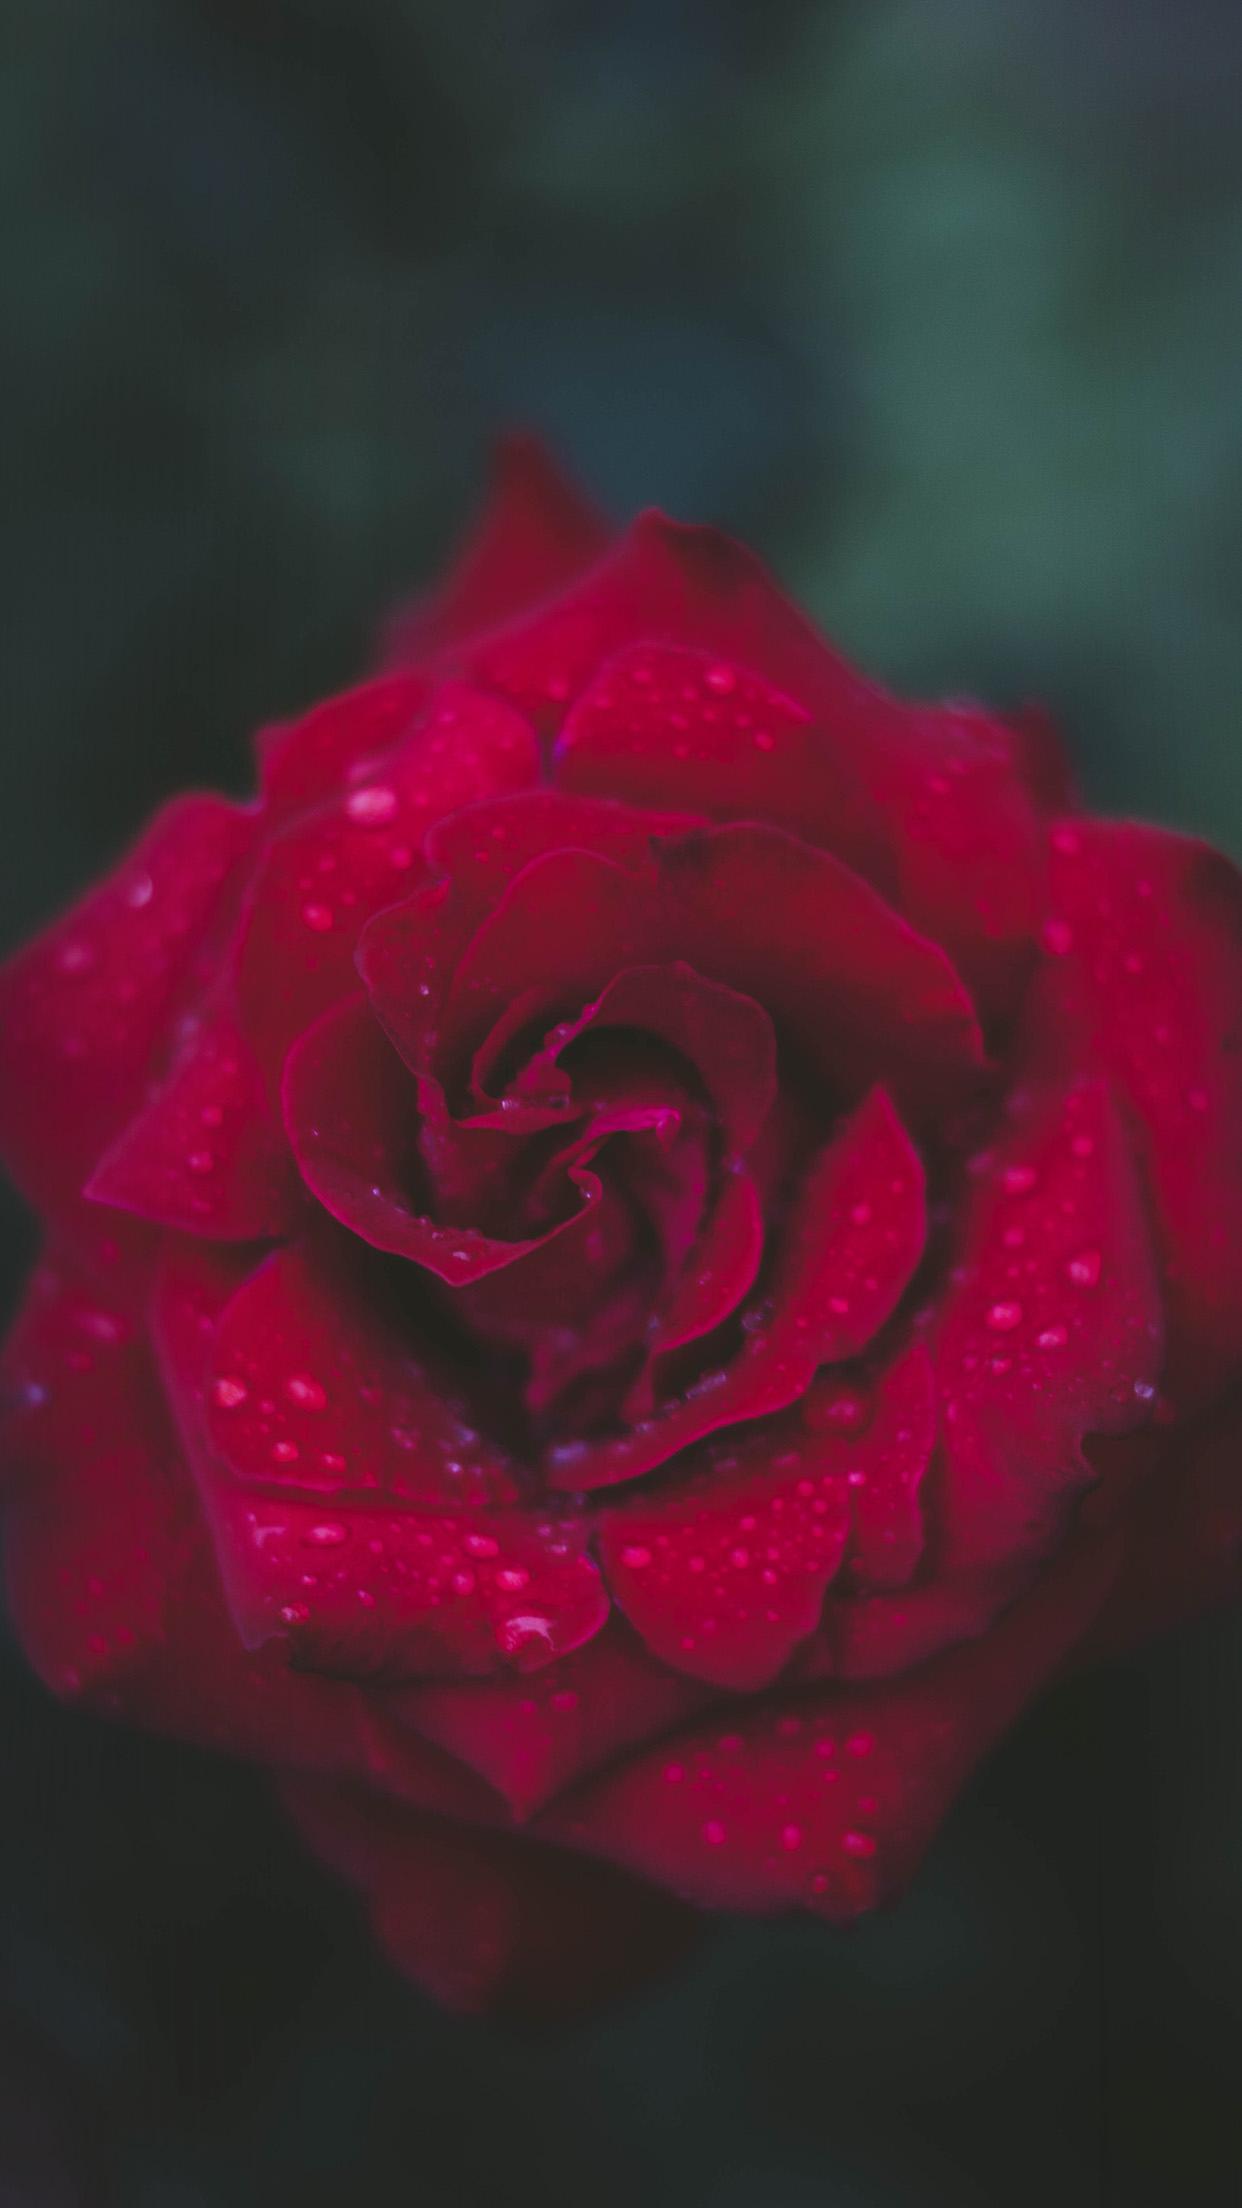 Rose Flower Wallpaper Download  Group